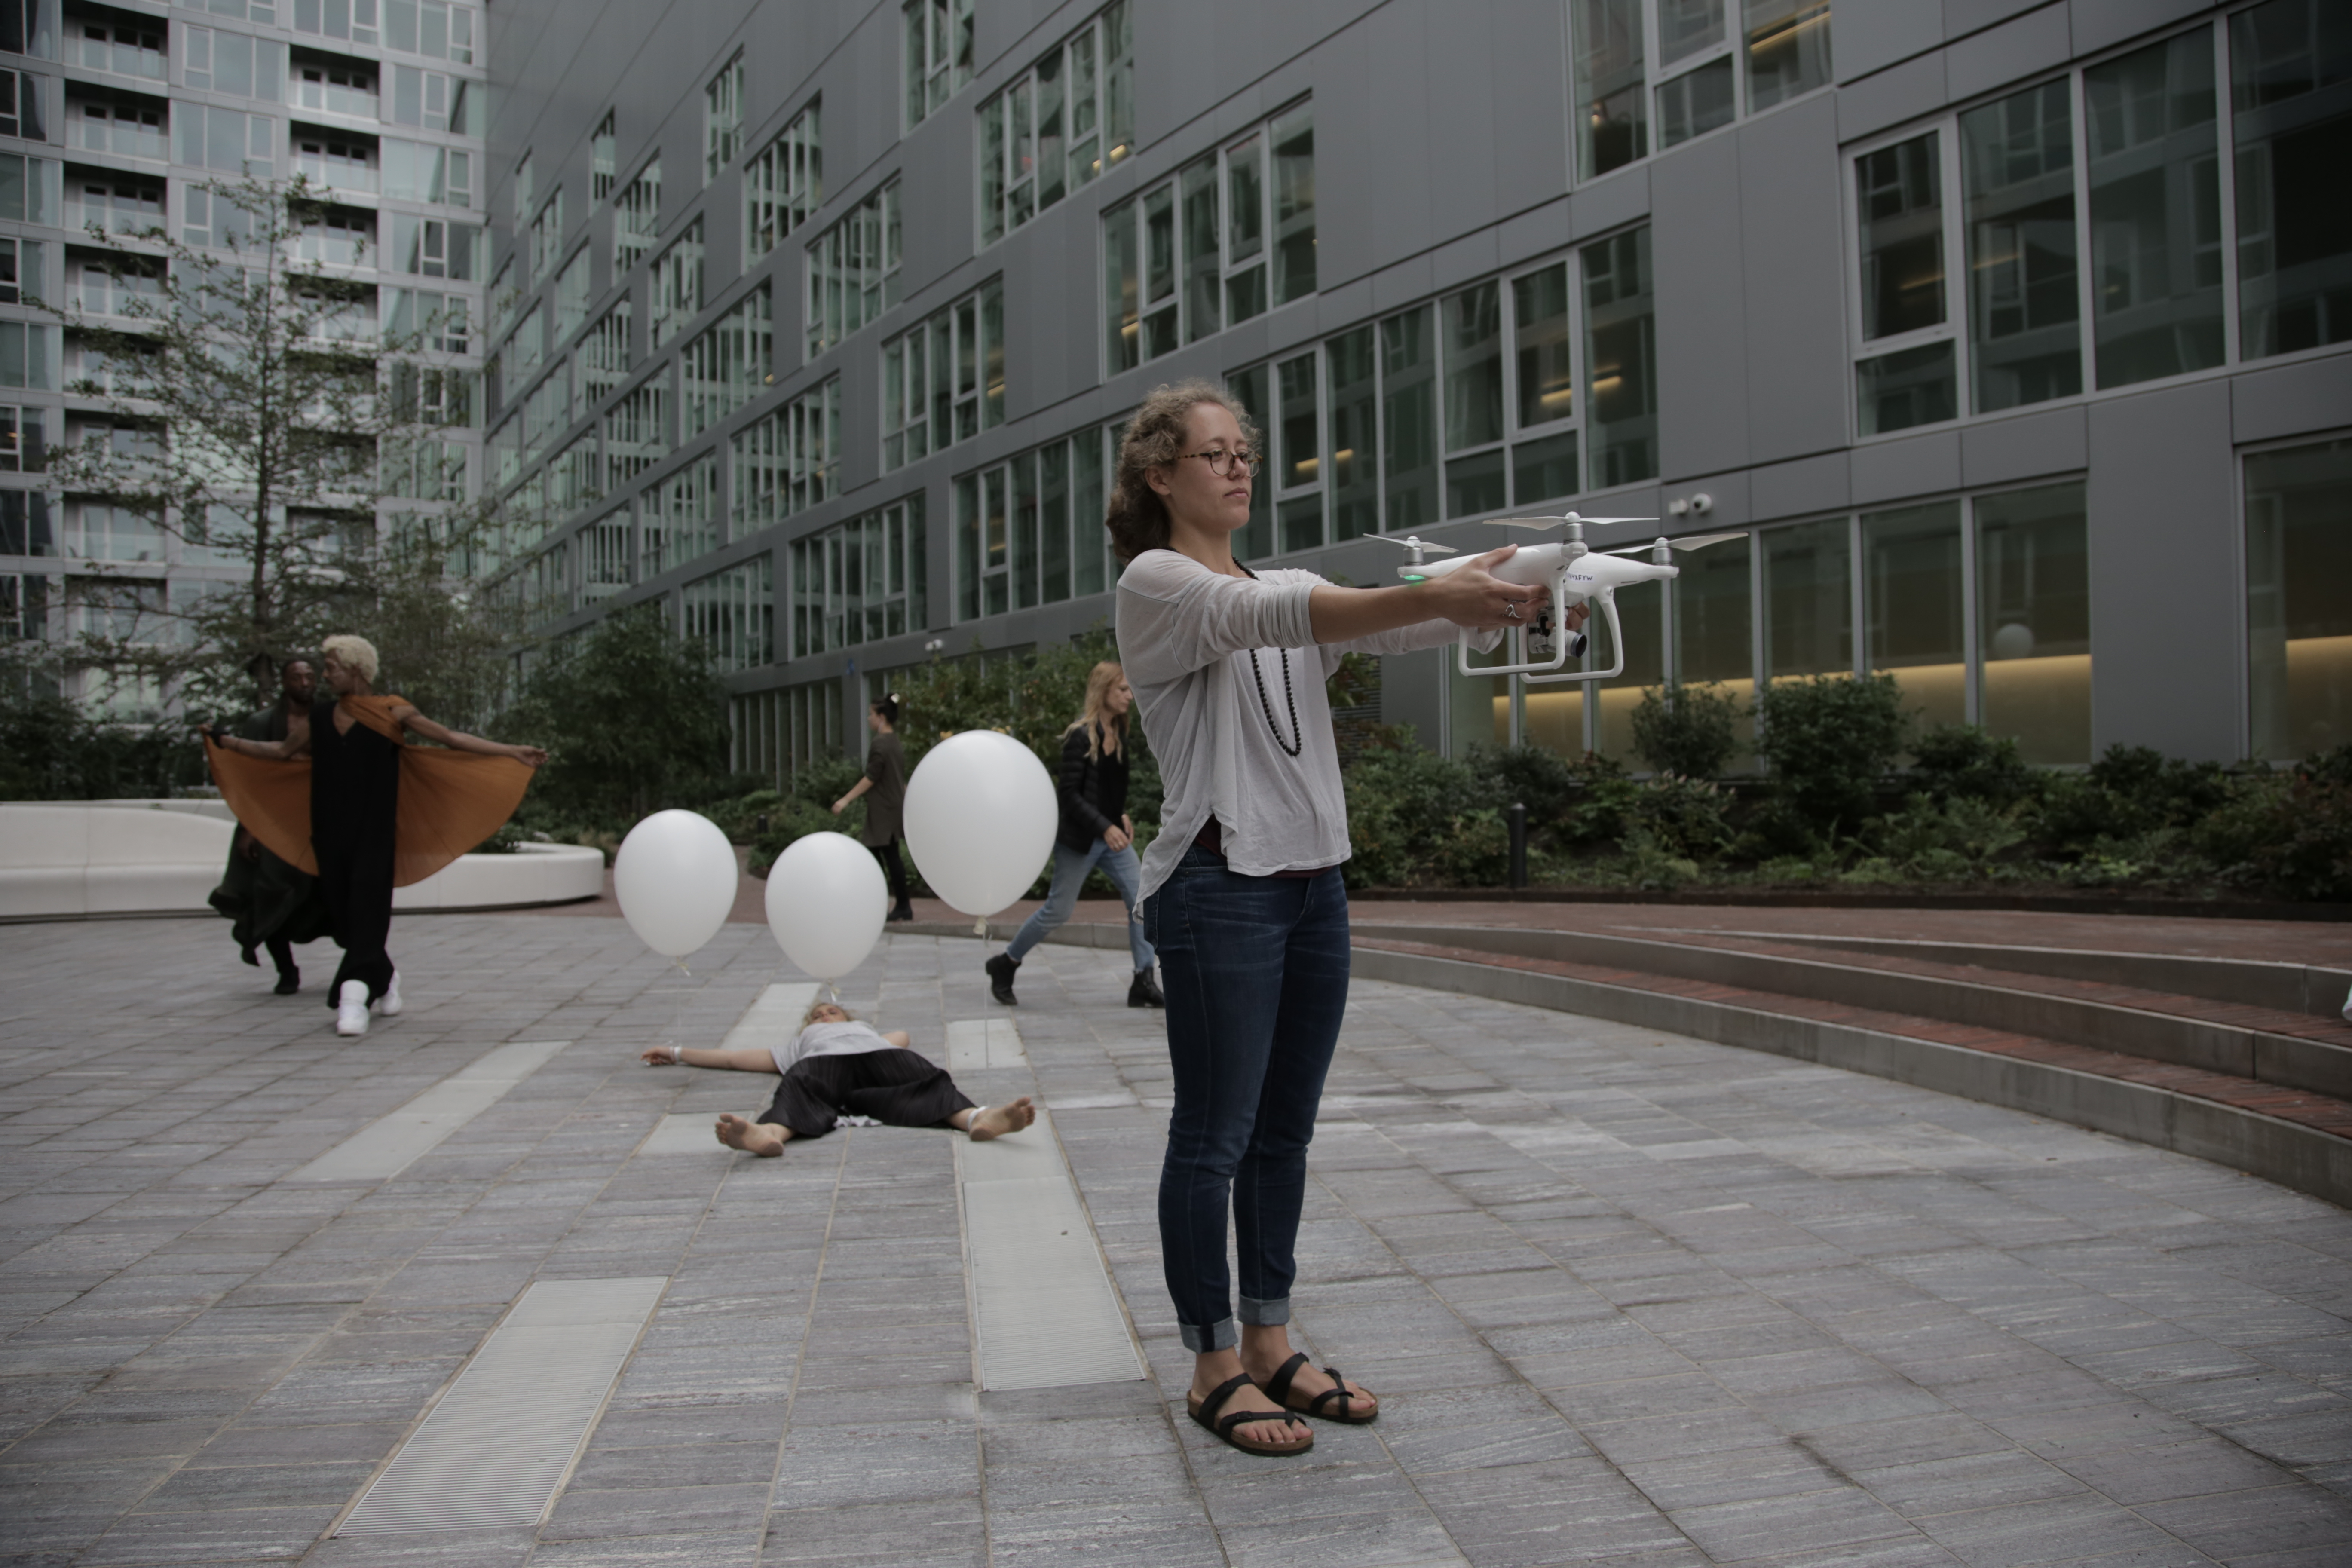 Meet New York-filmmaker and drone pilot Victoria Sendra